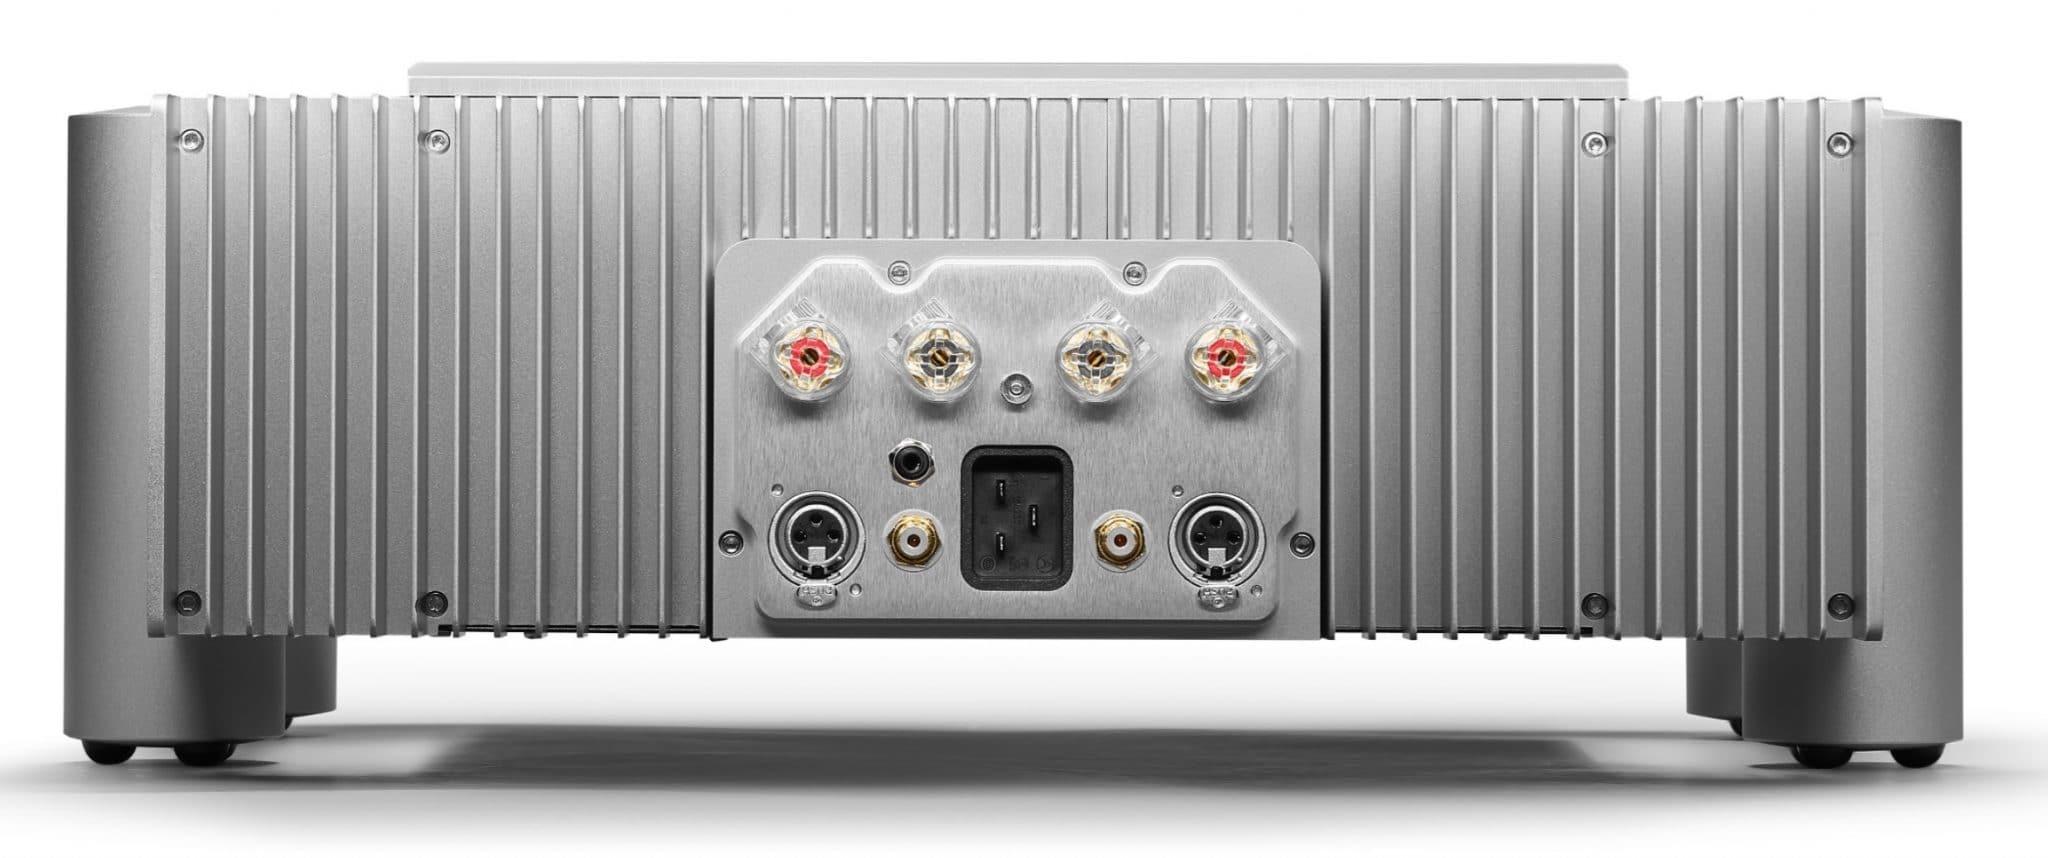 monoblock power amplifiers